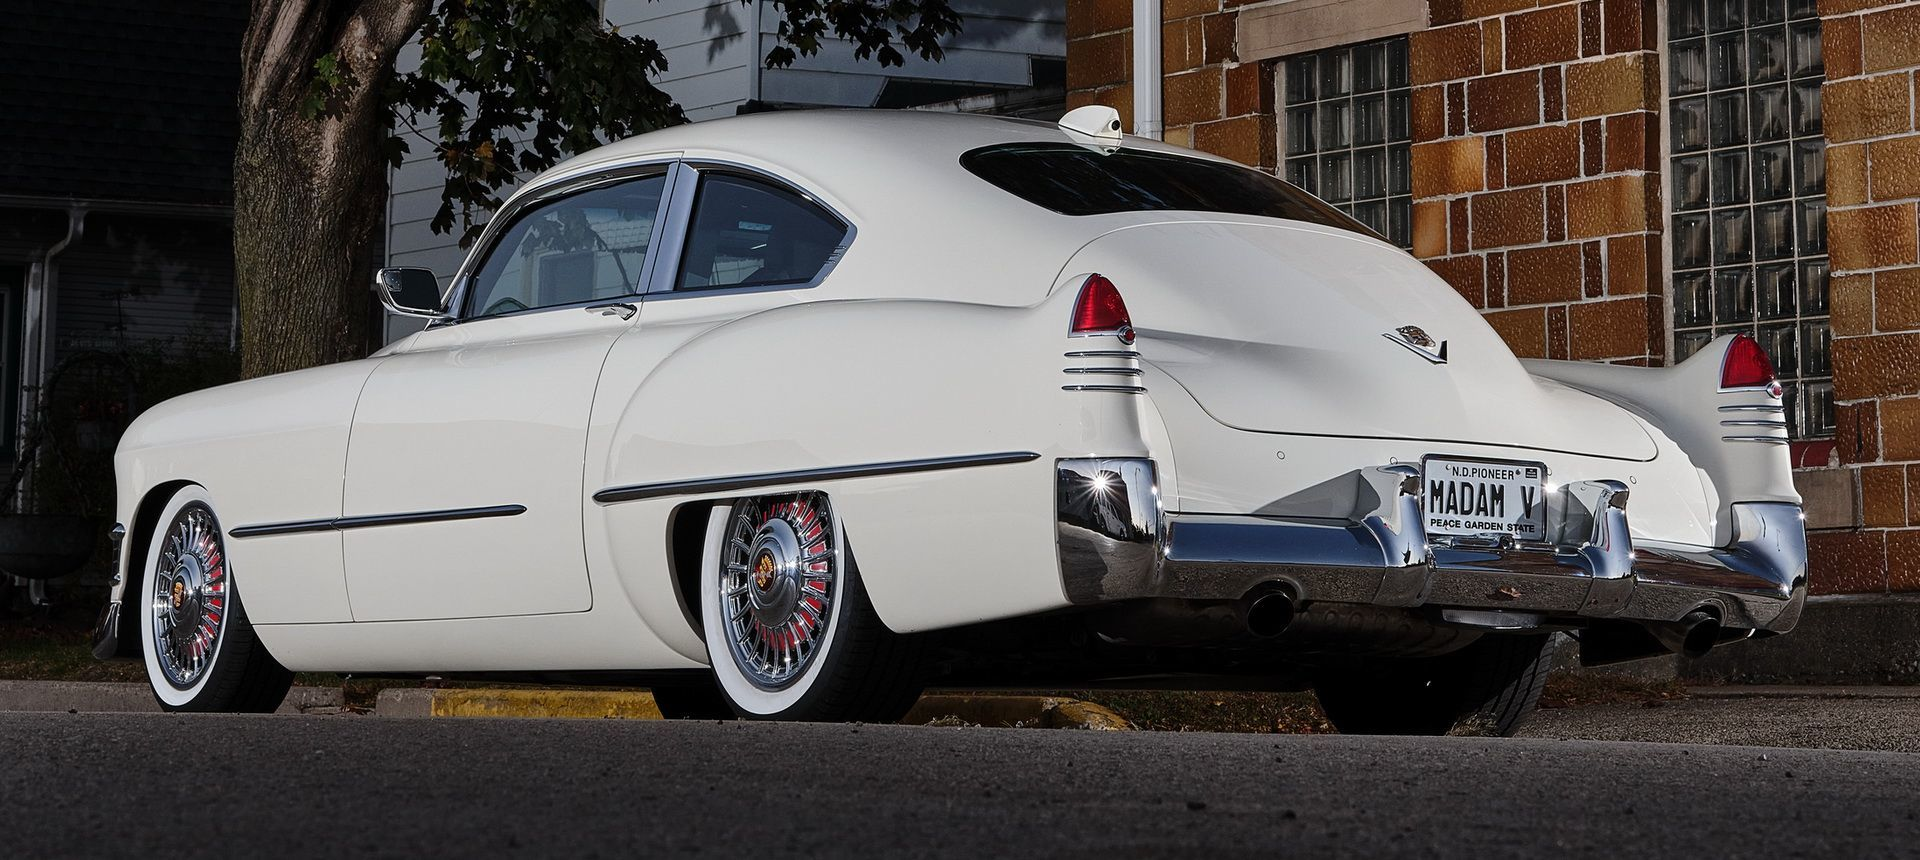 Madam V Cadillac Ringbrothers P